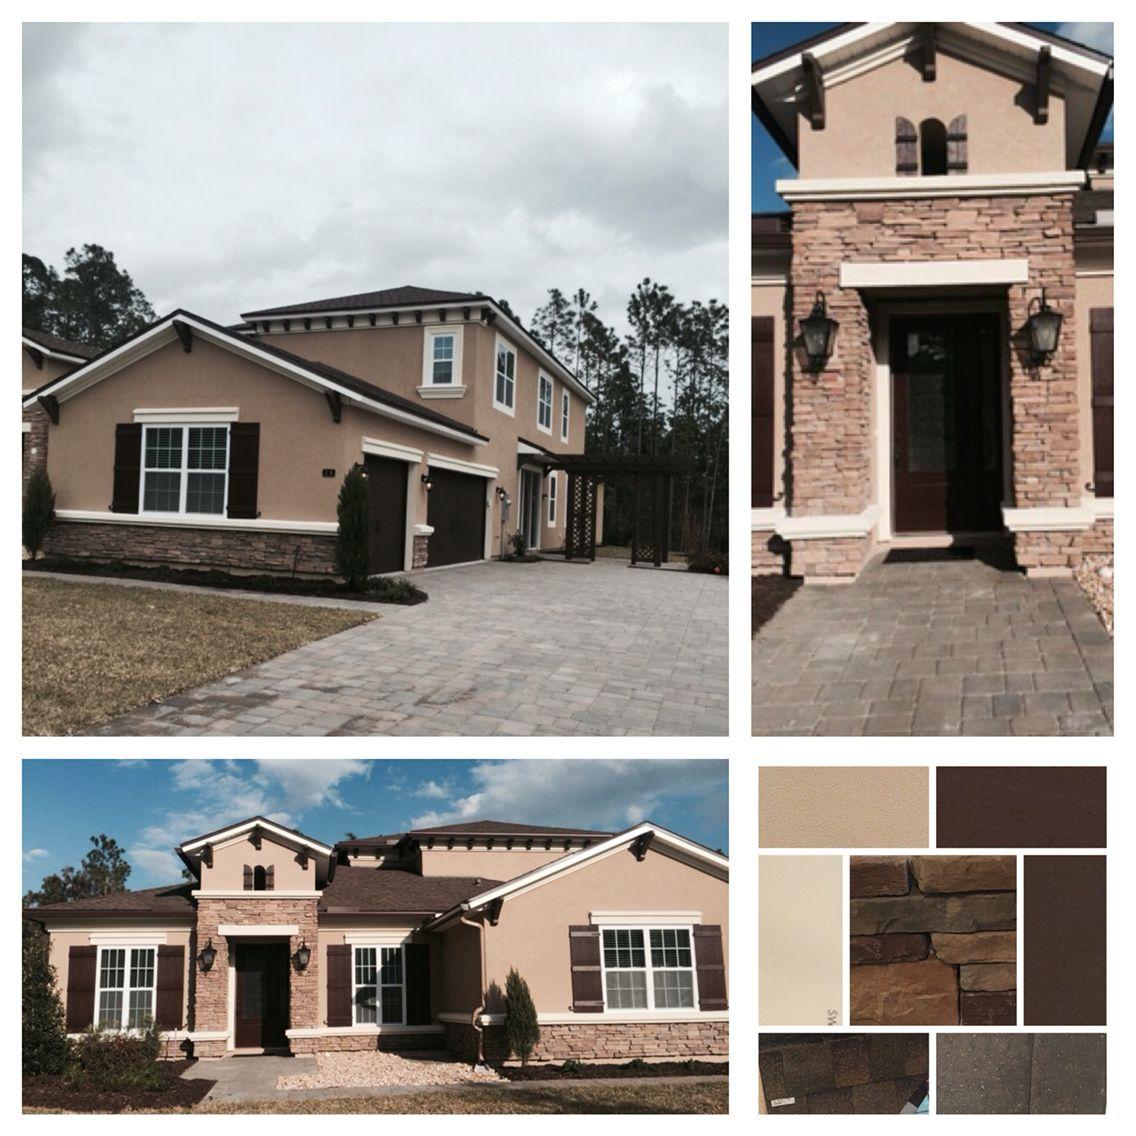 Exterior Paint Colors Stucco House Choosing For The: Color Pallet For The Exterior Of The House. Dryvit Stucco